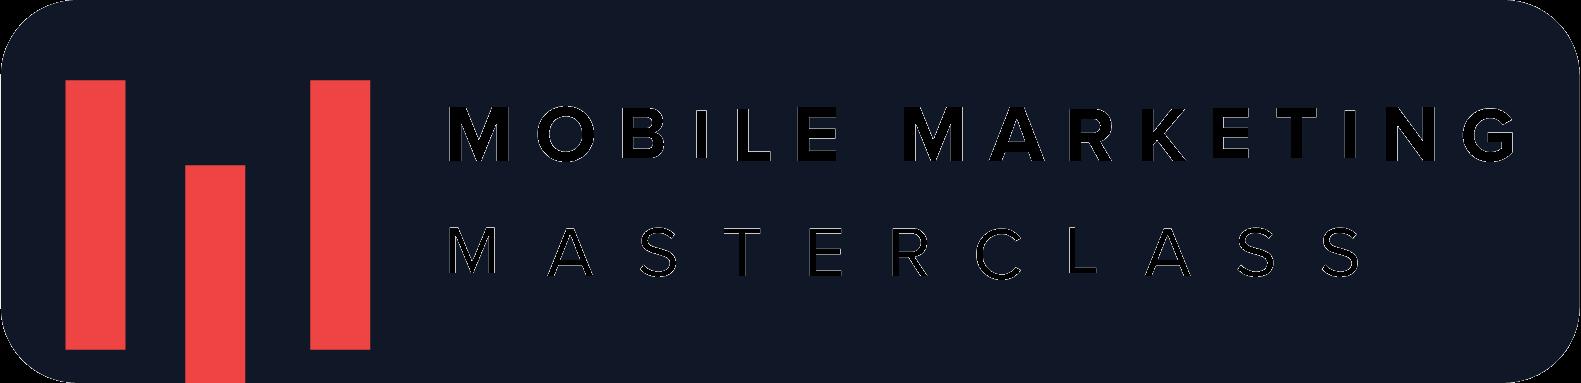 Mobile Marketing Masterclass